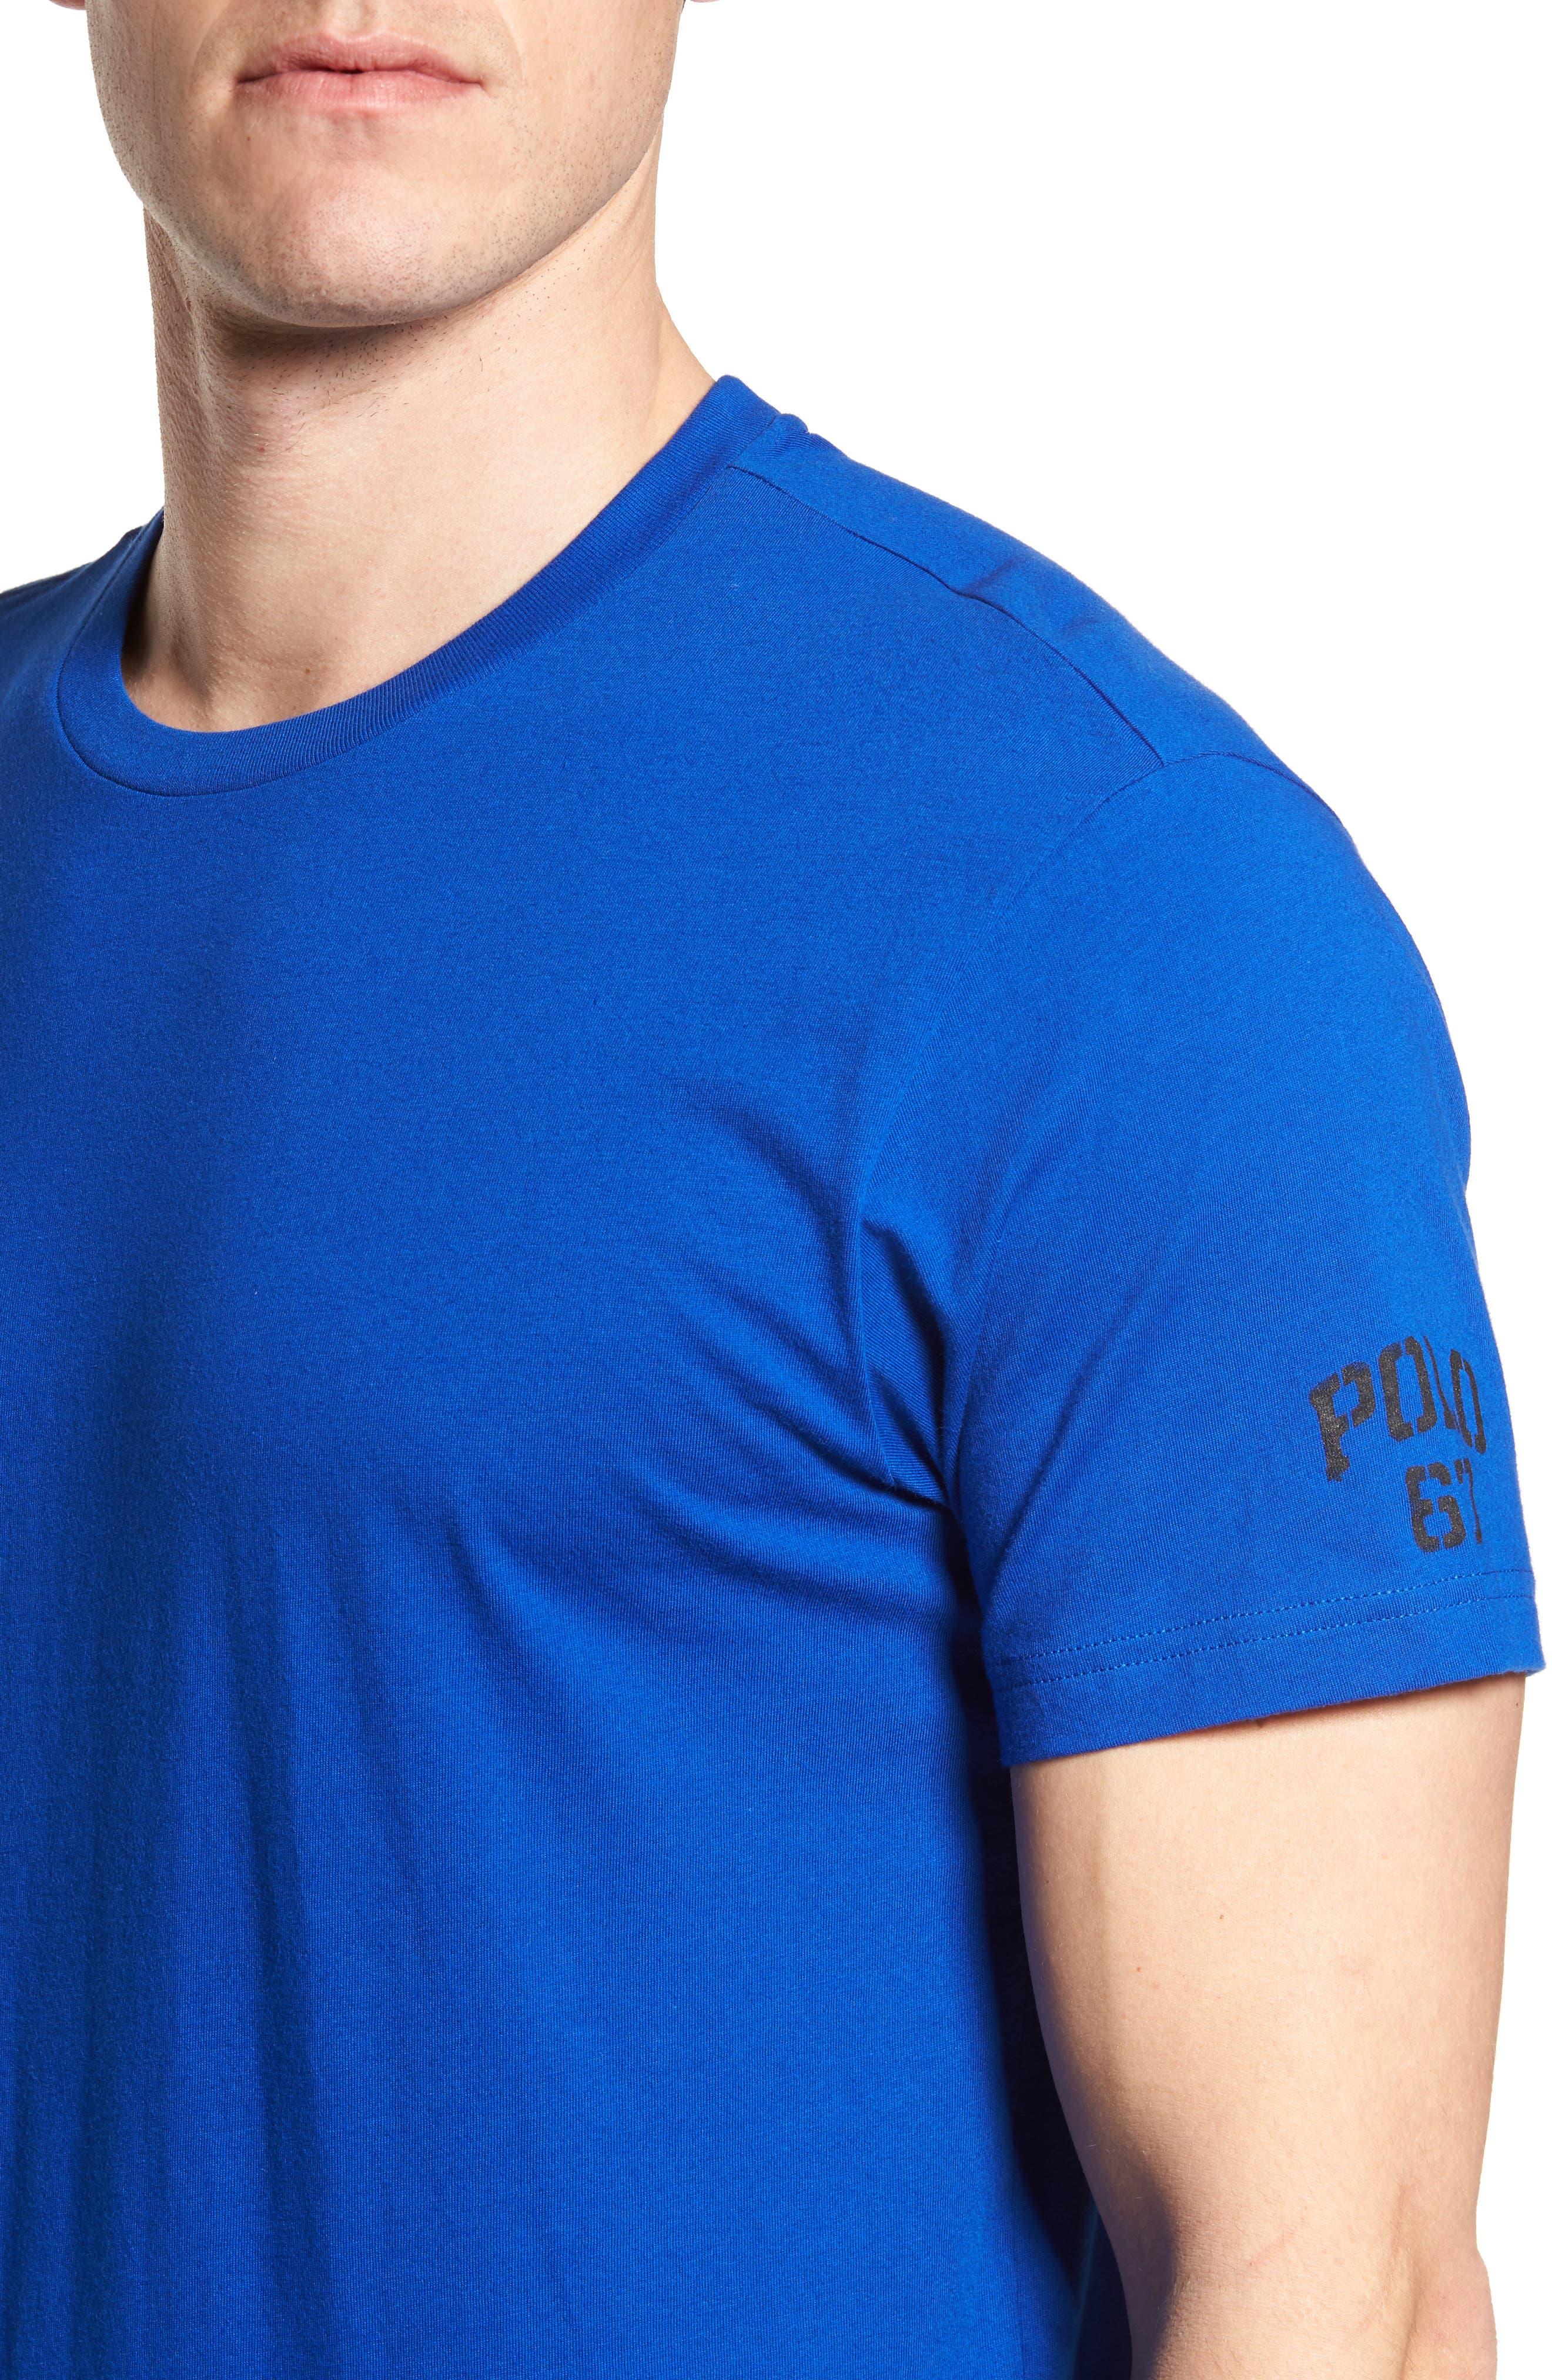 Polo Ralph Lauren Crewneck T-Shirt,                             Alternate thumbnail 4, color,                             Sapphire Star/ Crescent Cream